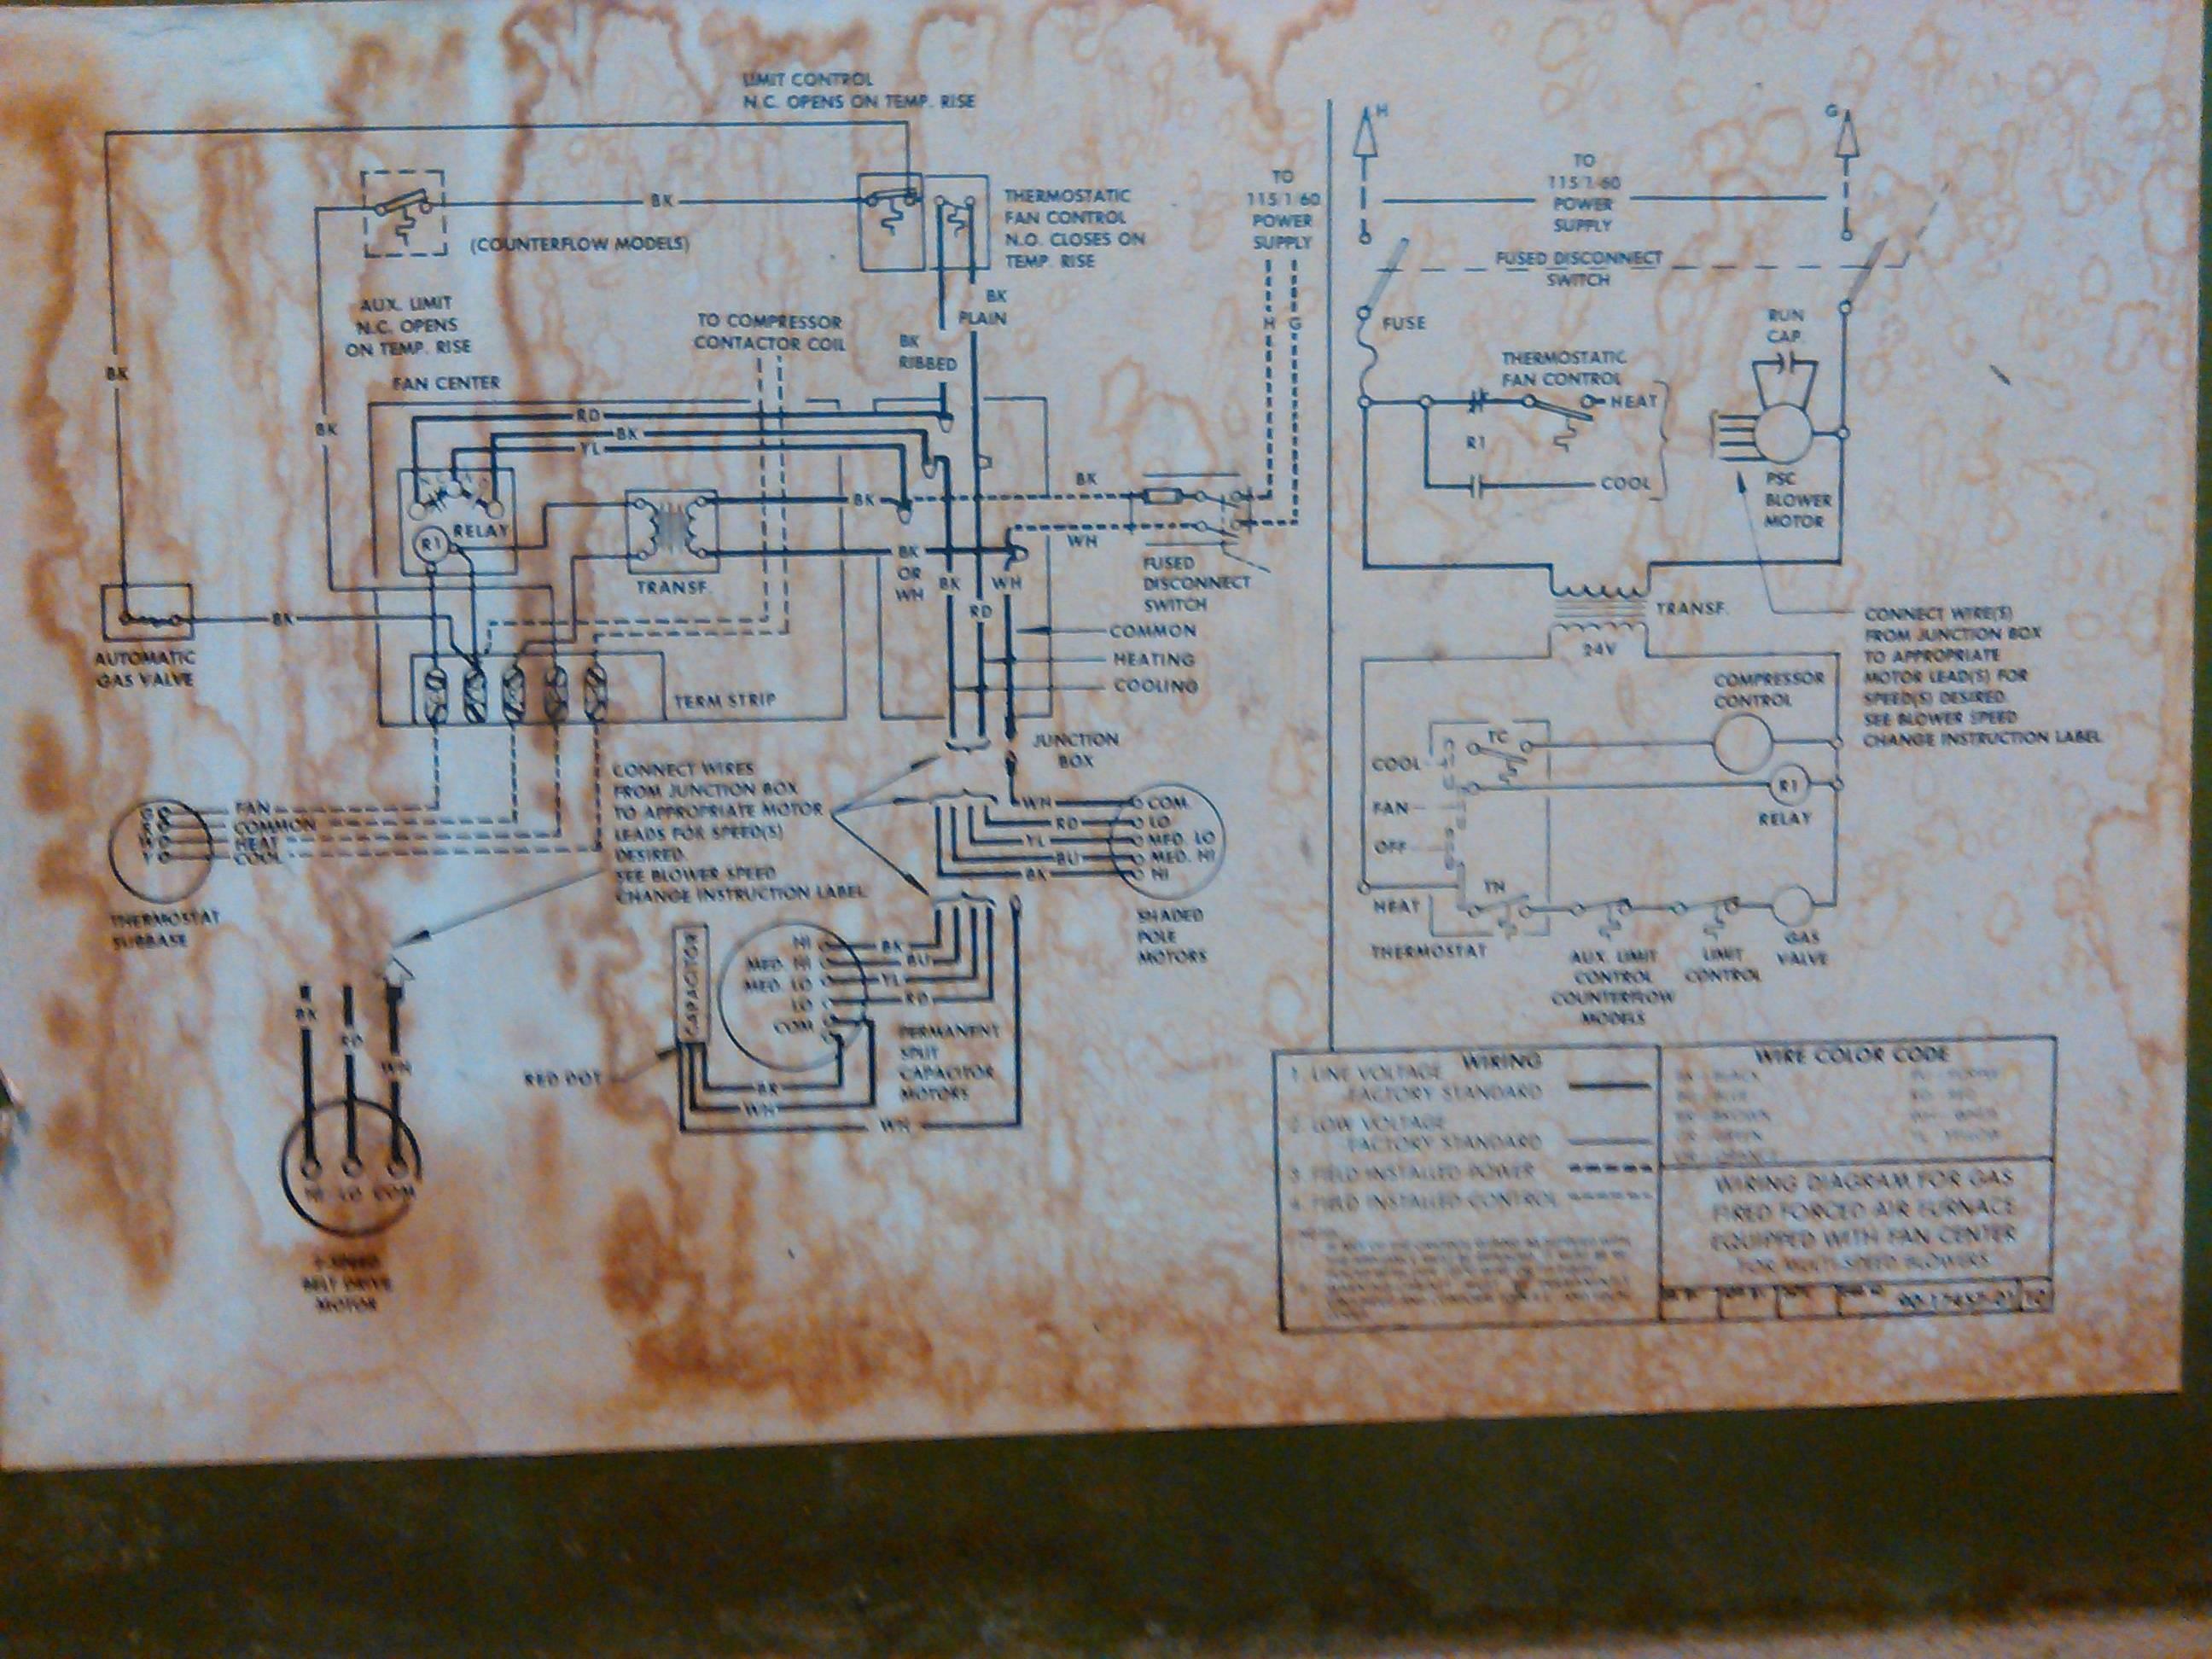 mars motor 10463 wiring diagram 31 wiring diagram images